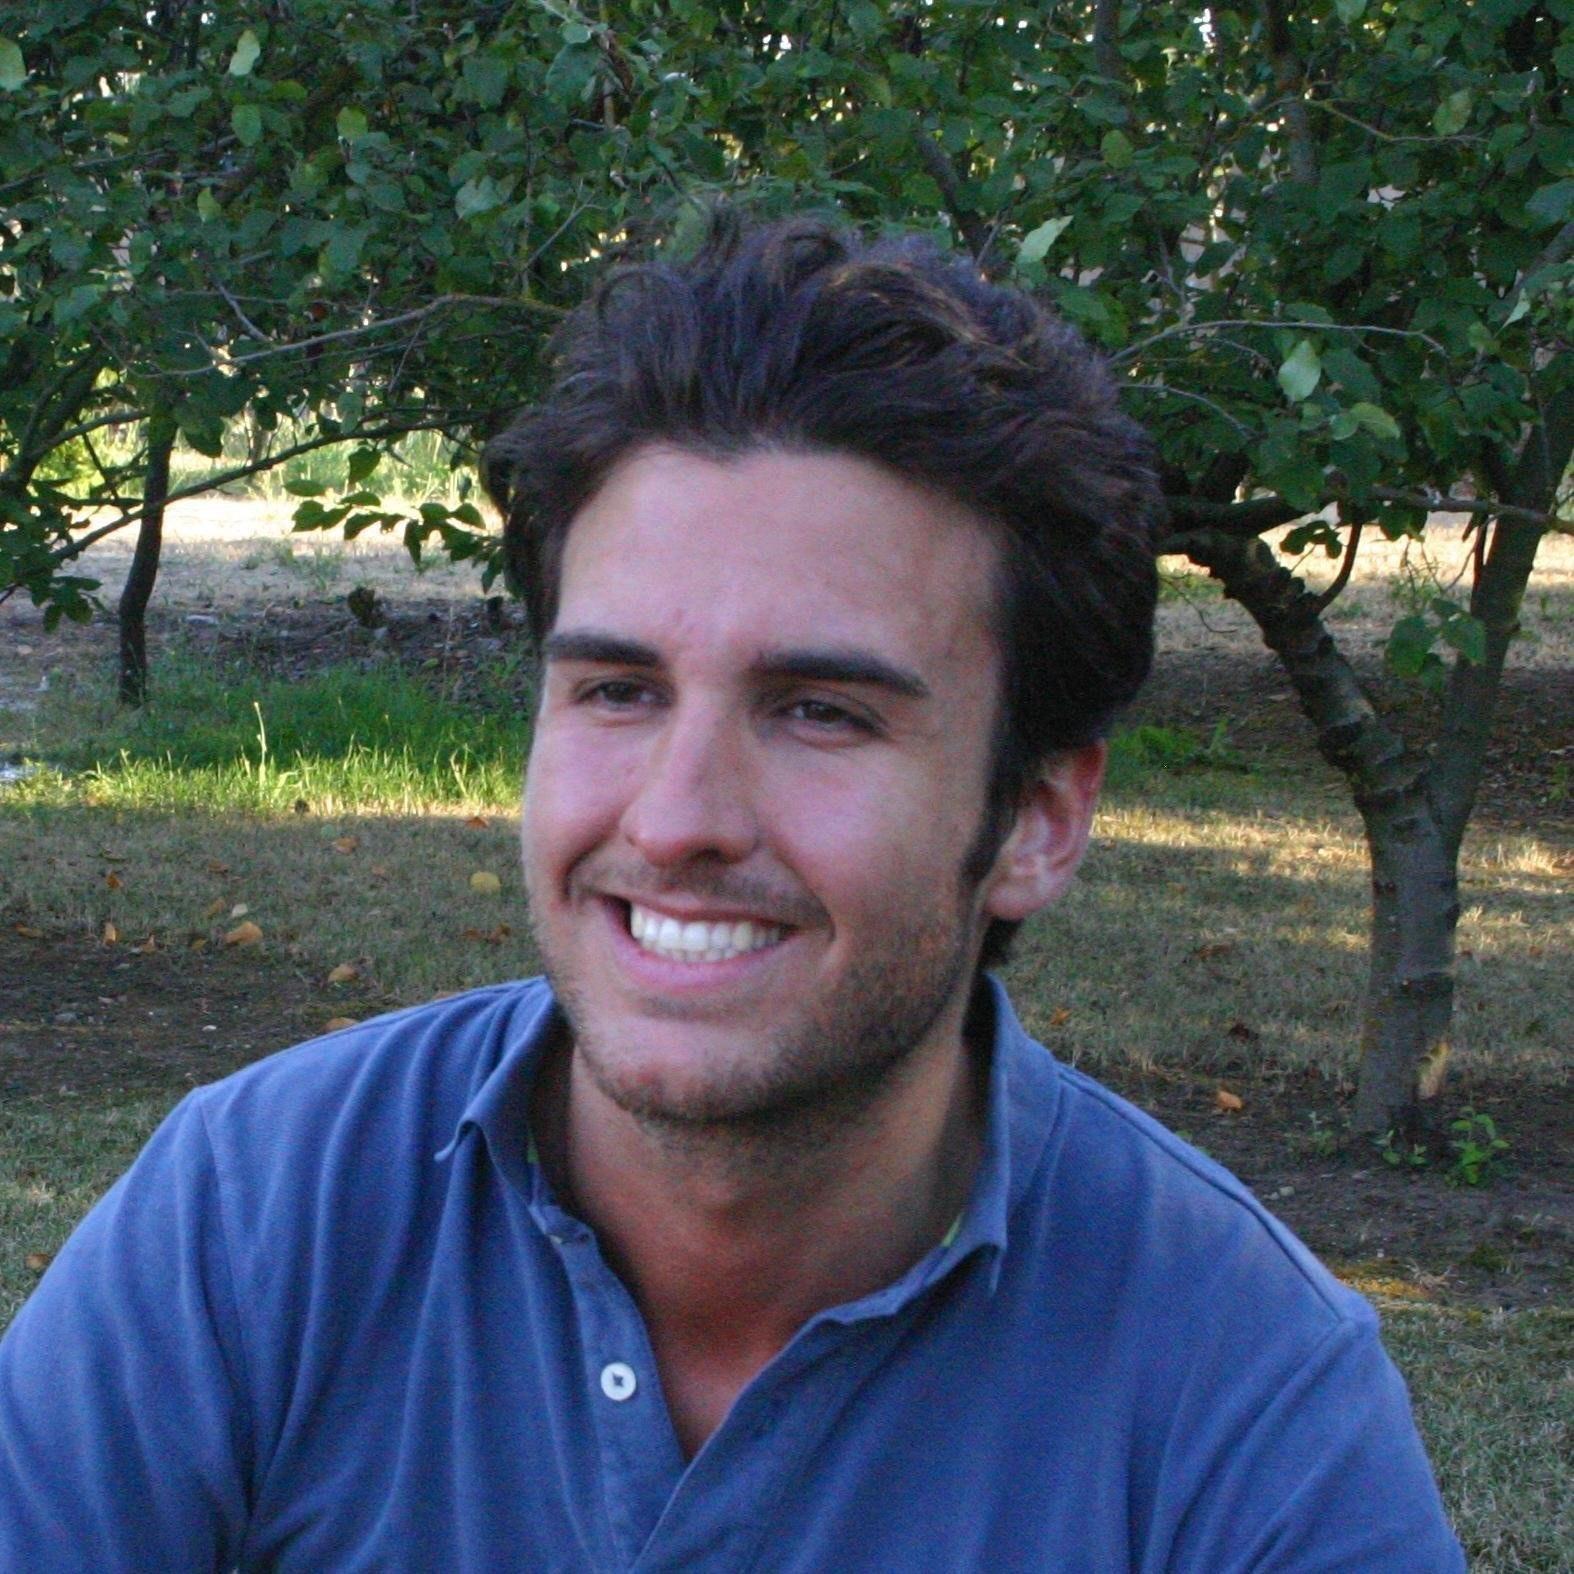 Diego Rivas-Navazo